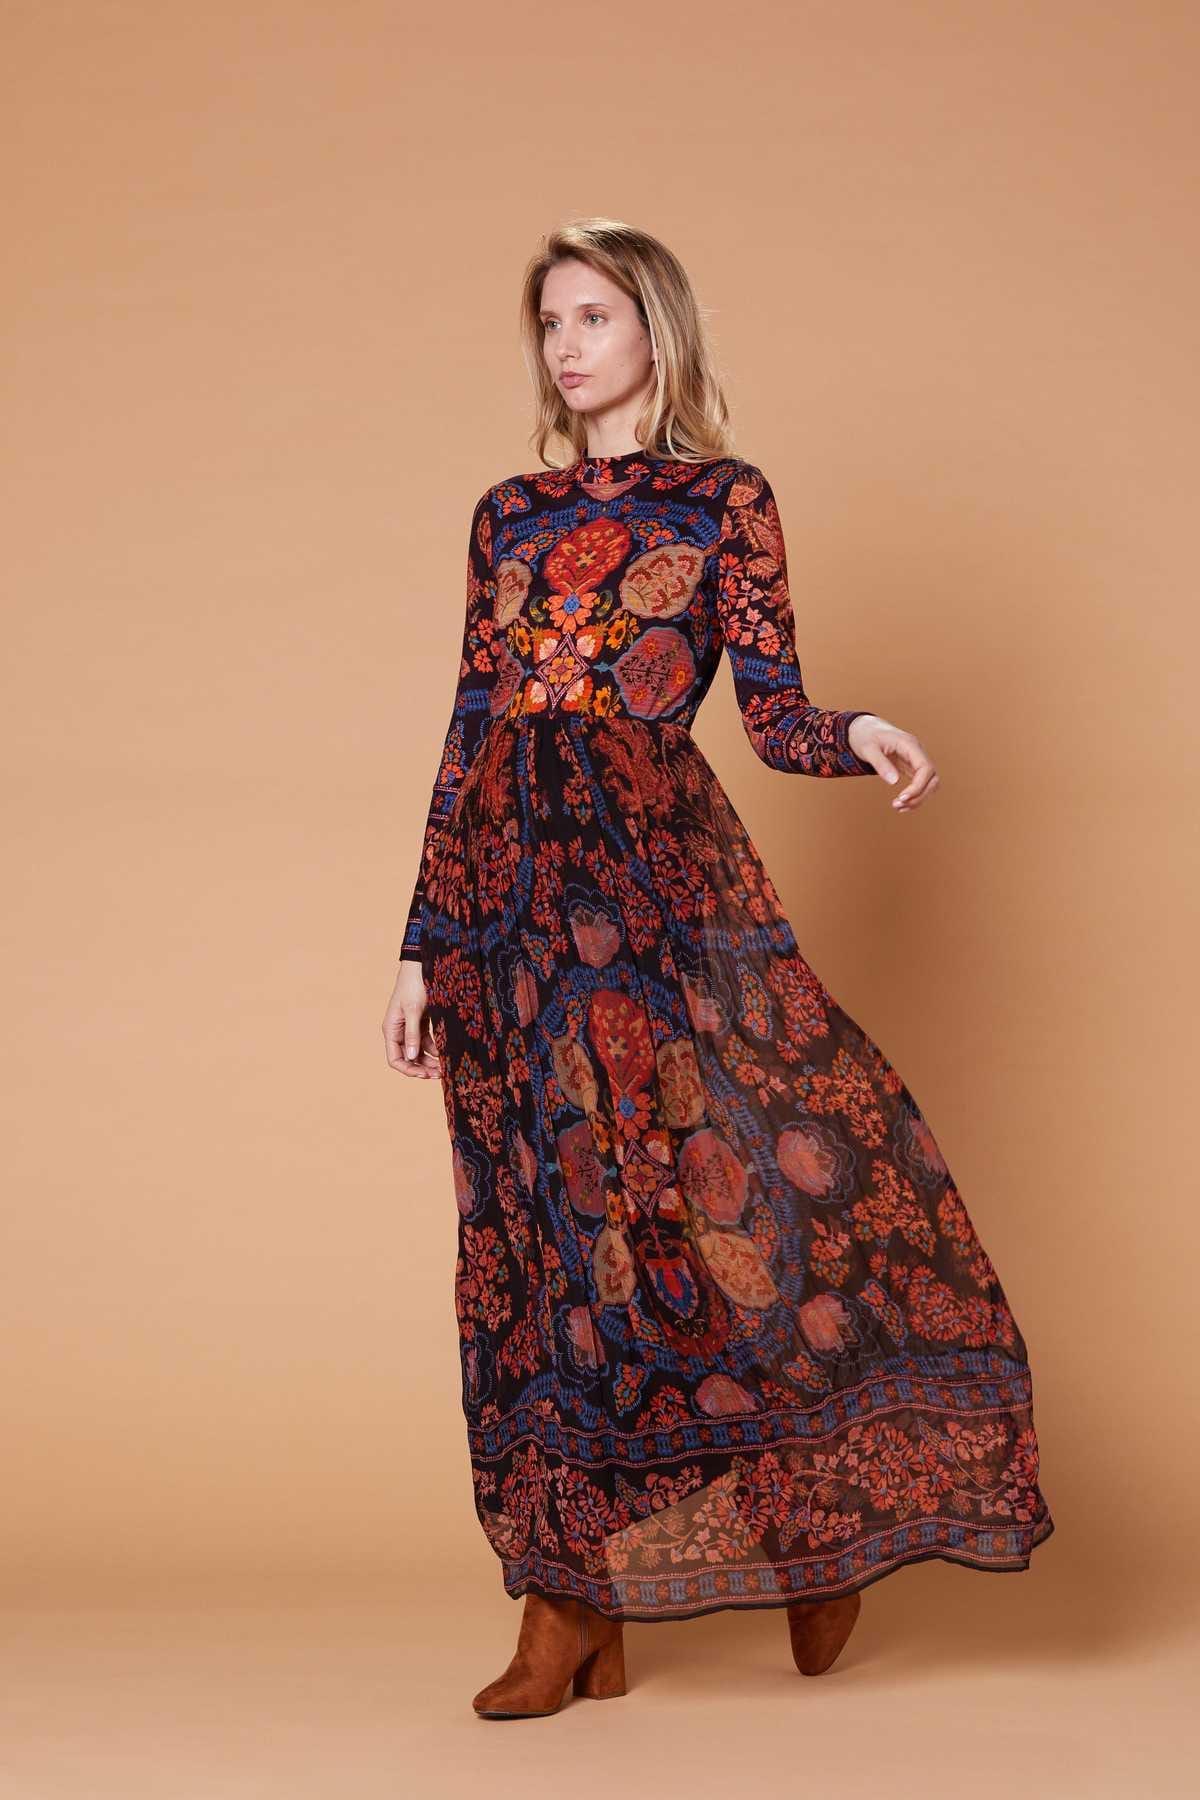 Longue Robe Imprimee Bandabougoir Derhy